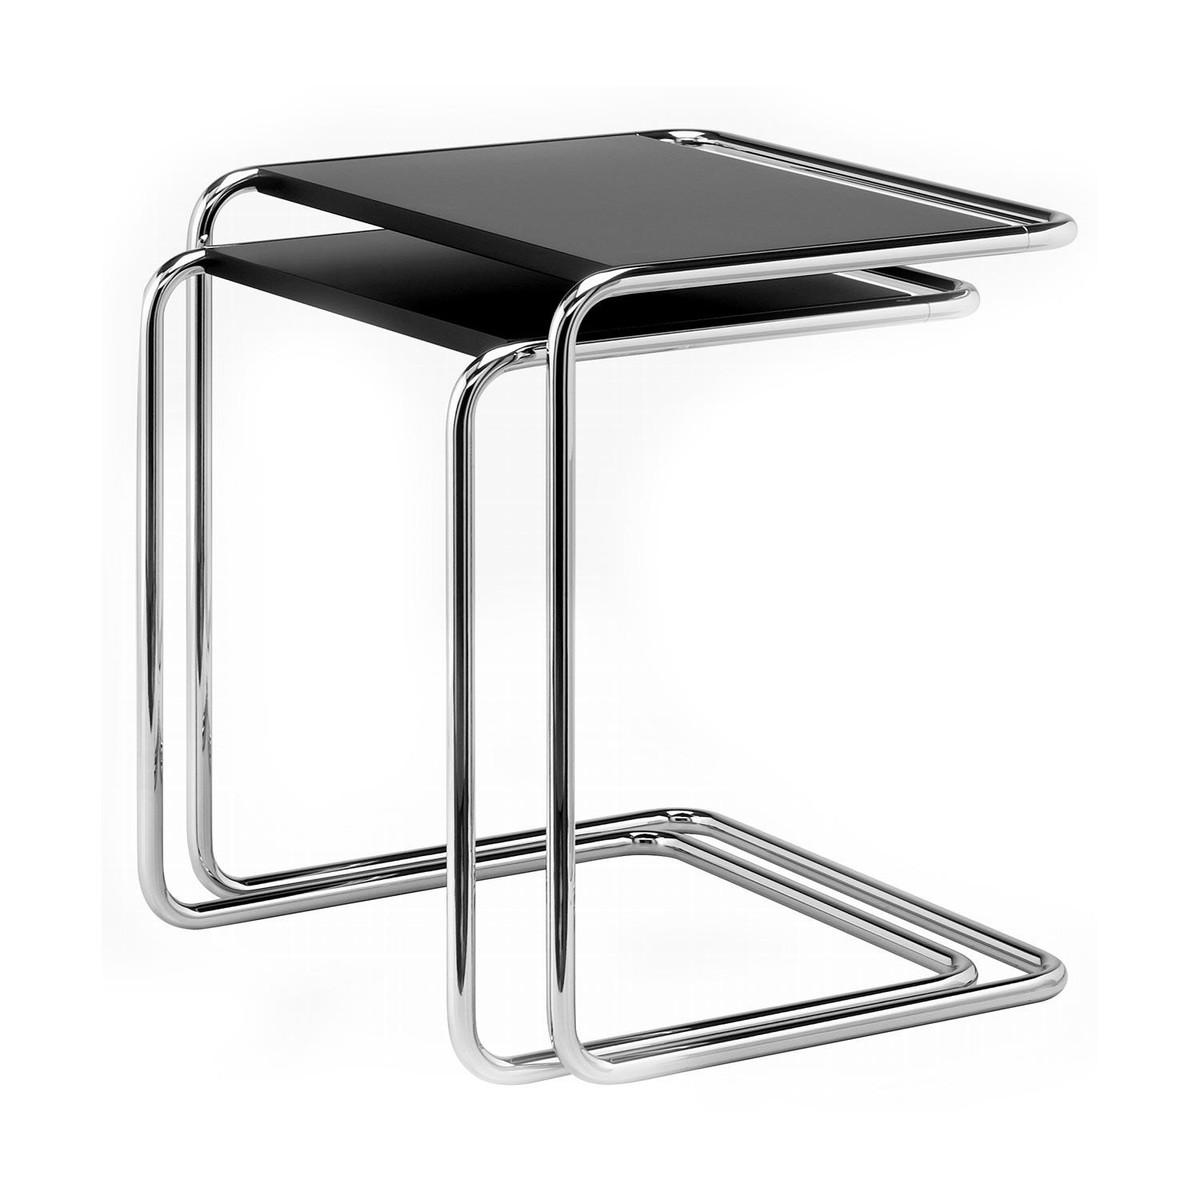 Thonet b 97 side table thonet for Table thonet